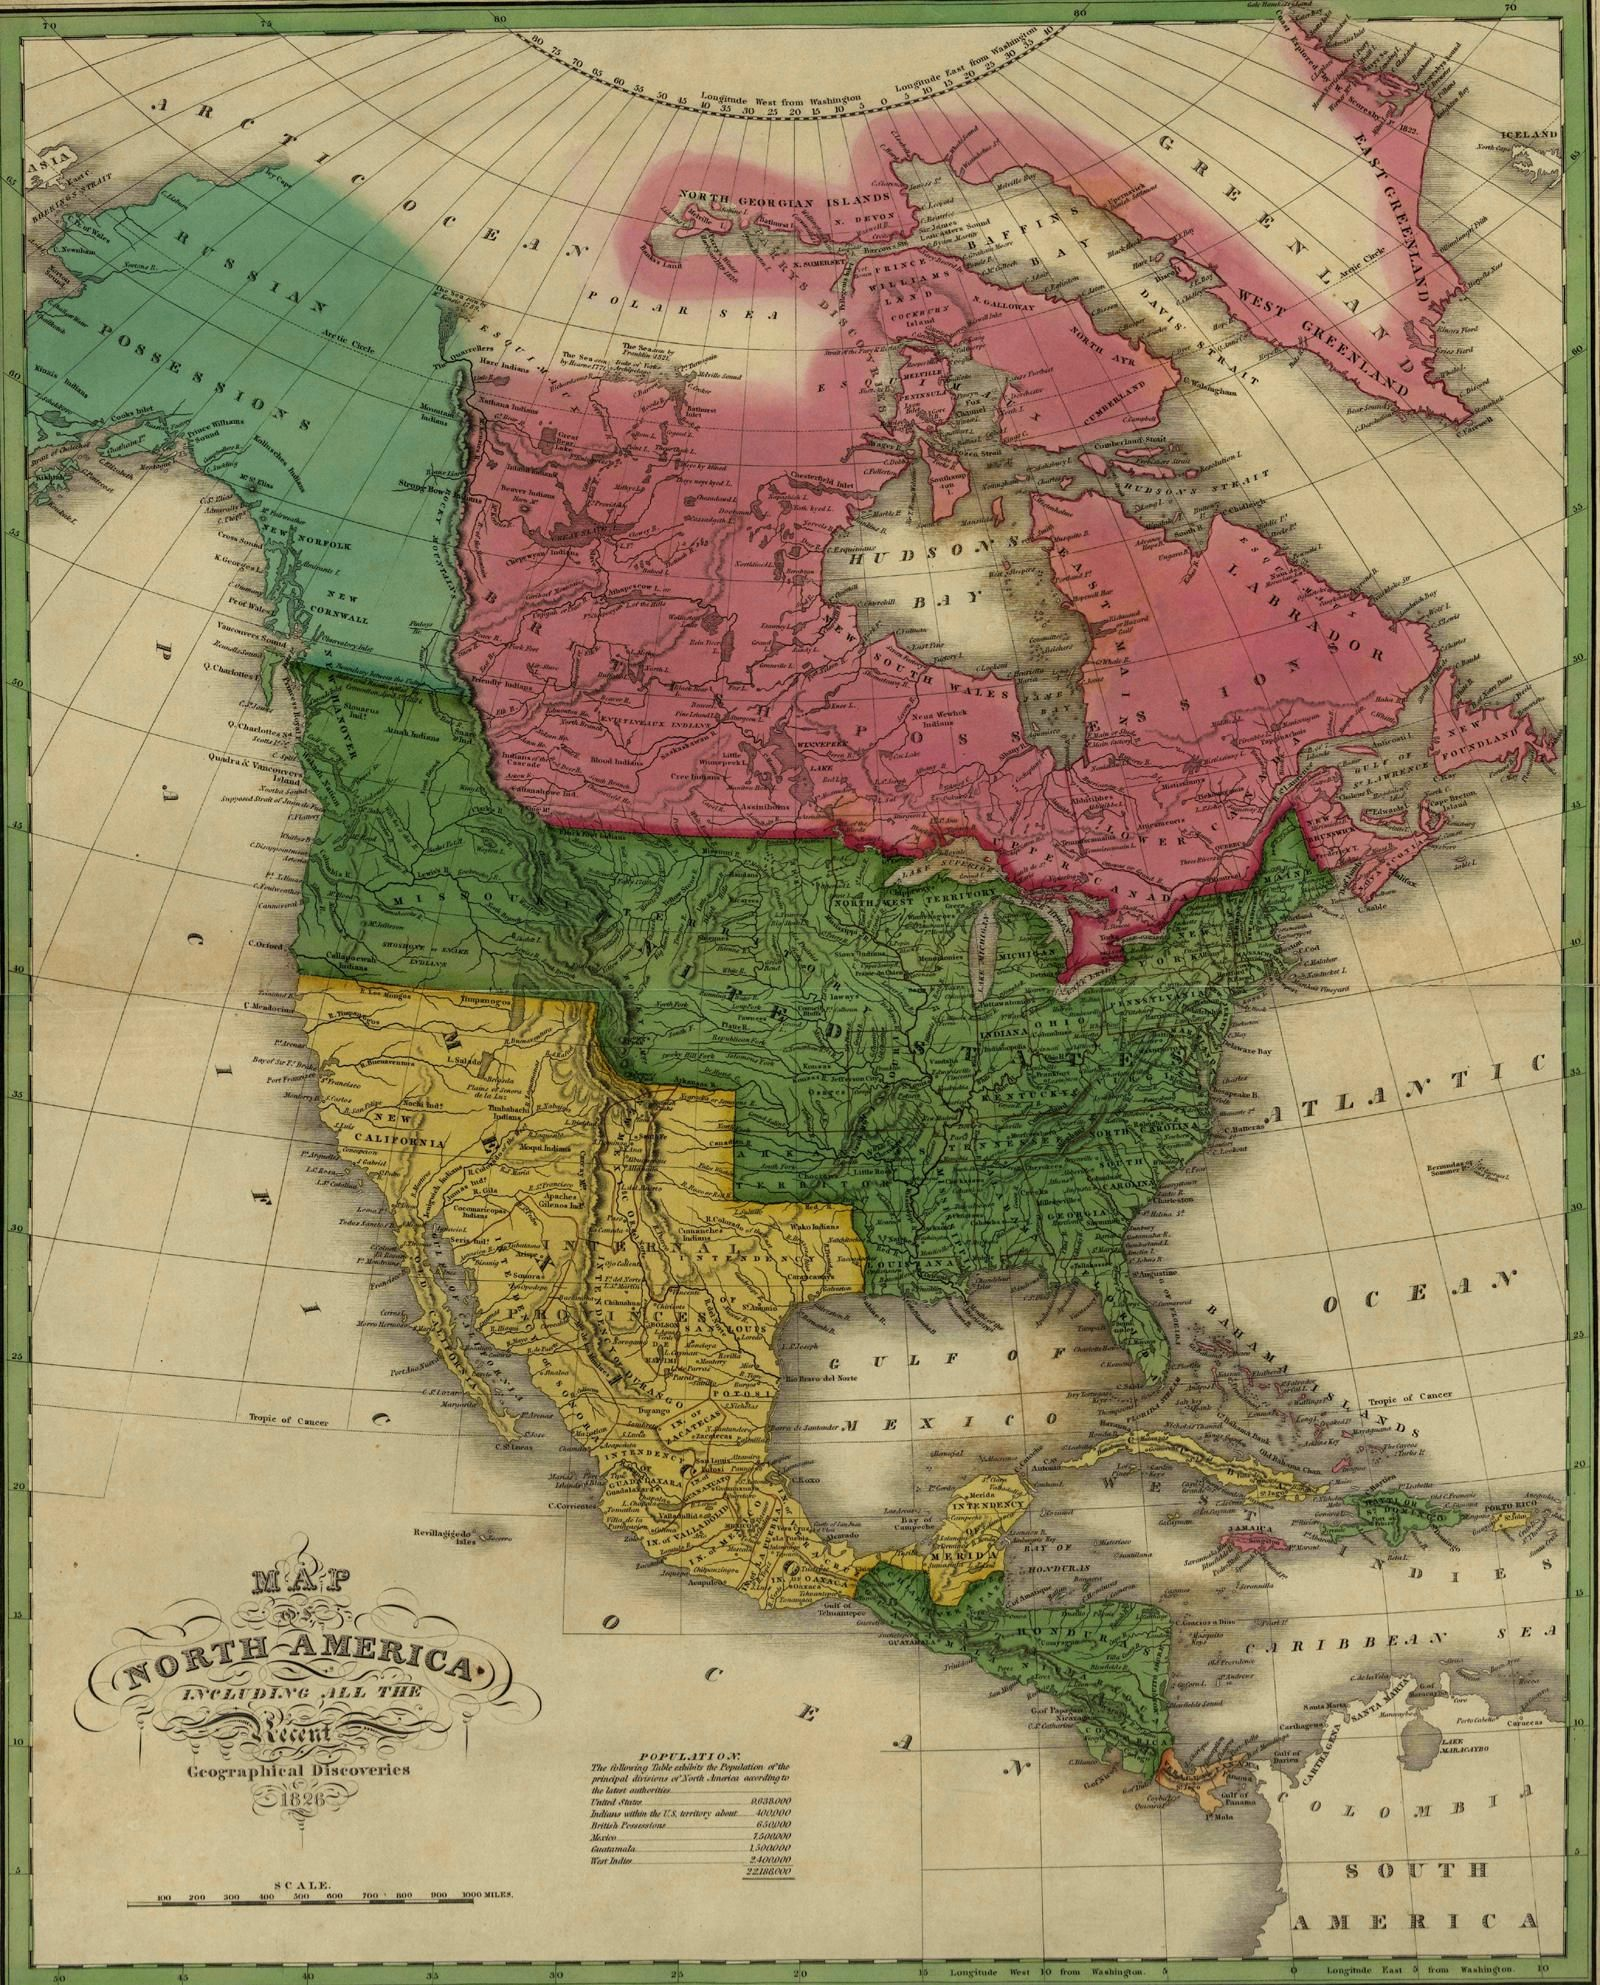 Pin de Kristin Lehman en Genealogy | Pinterest